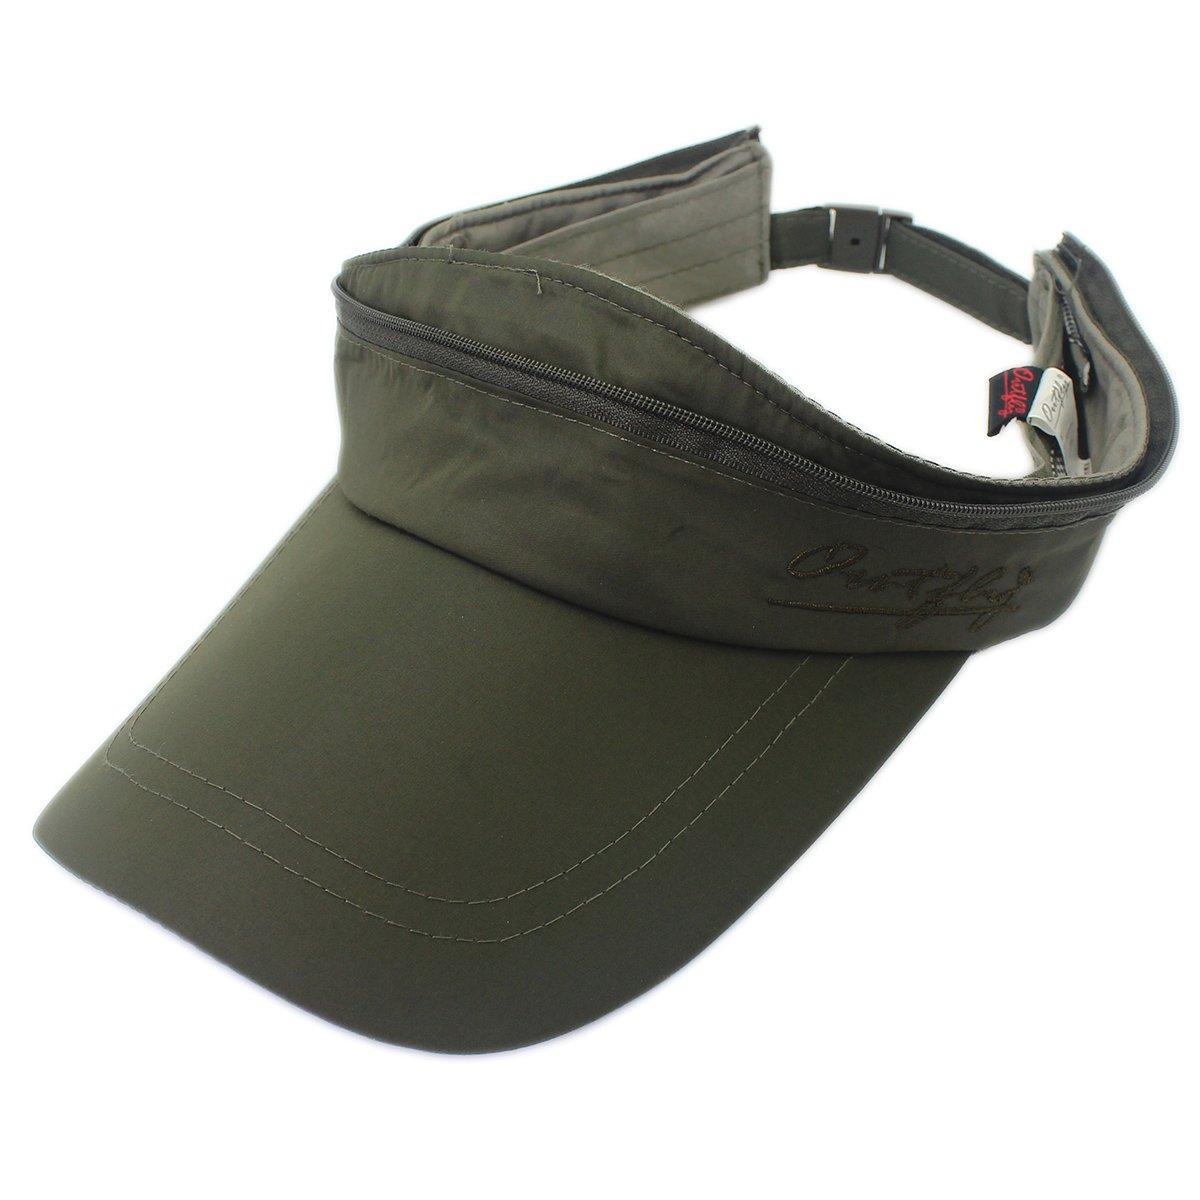 outfly Dual-Purpose Sunshade Visors Men's Summer Sunhat Baseball Cap Army Green Cap